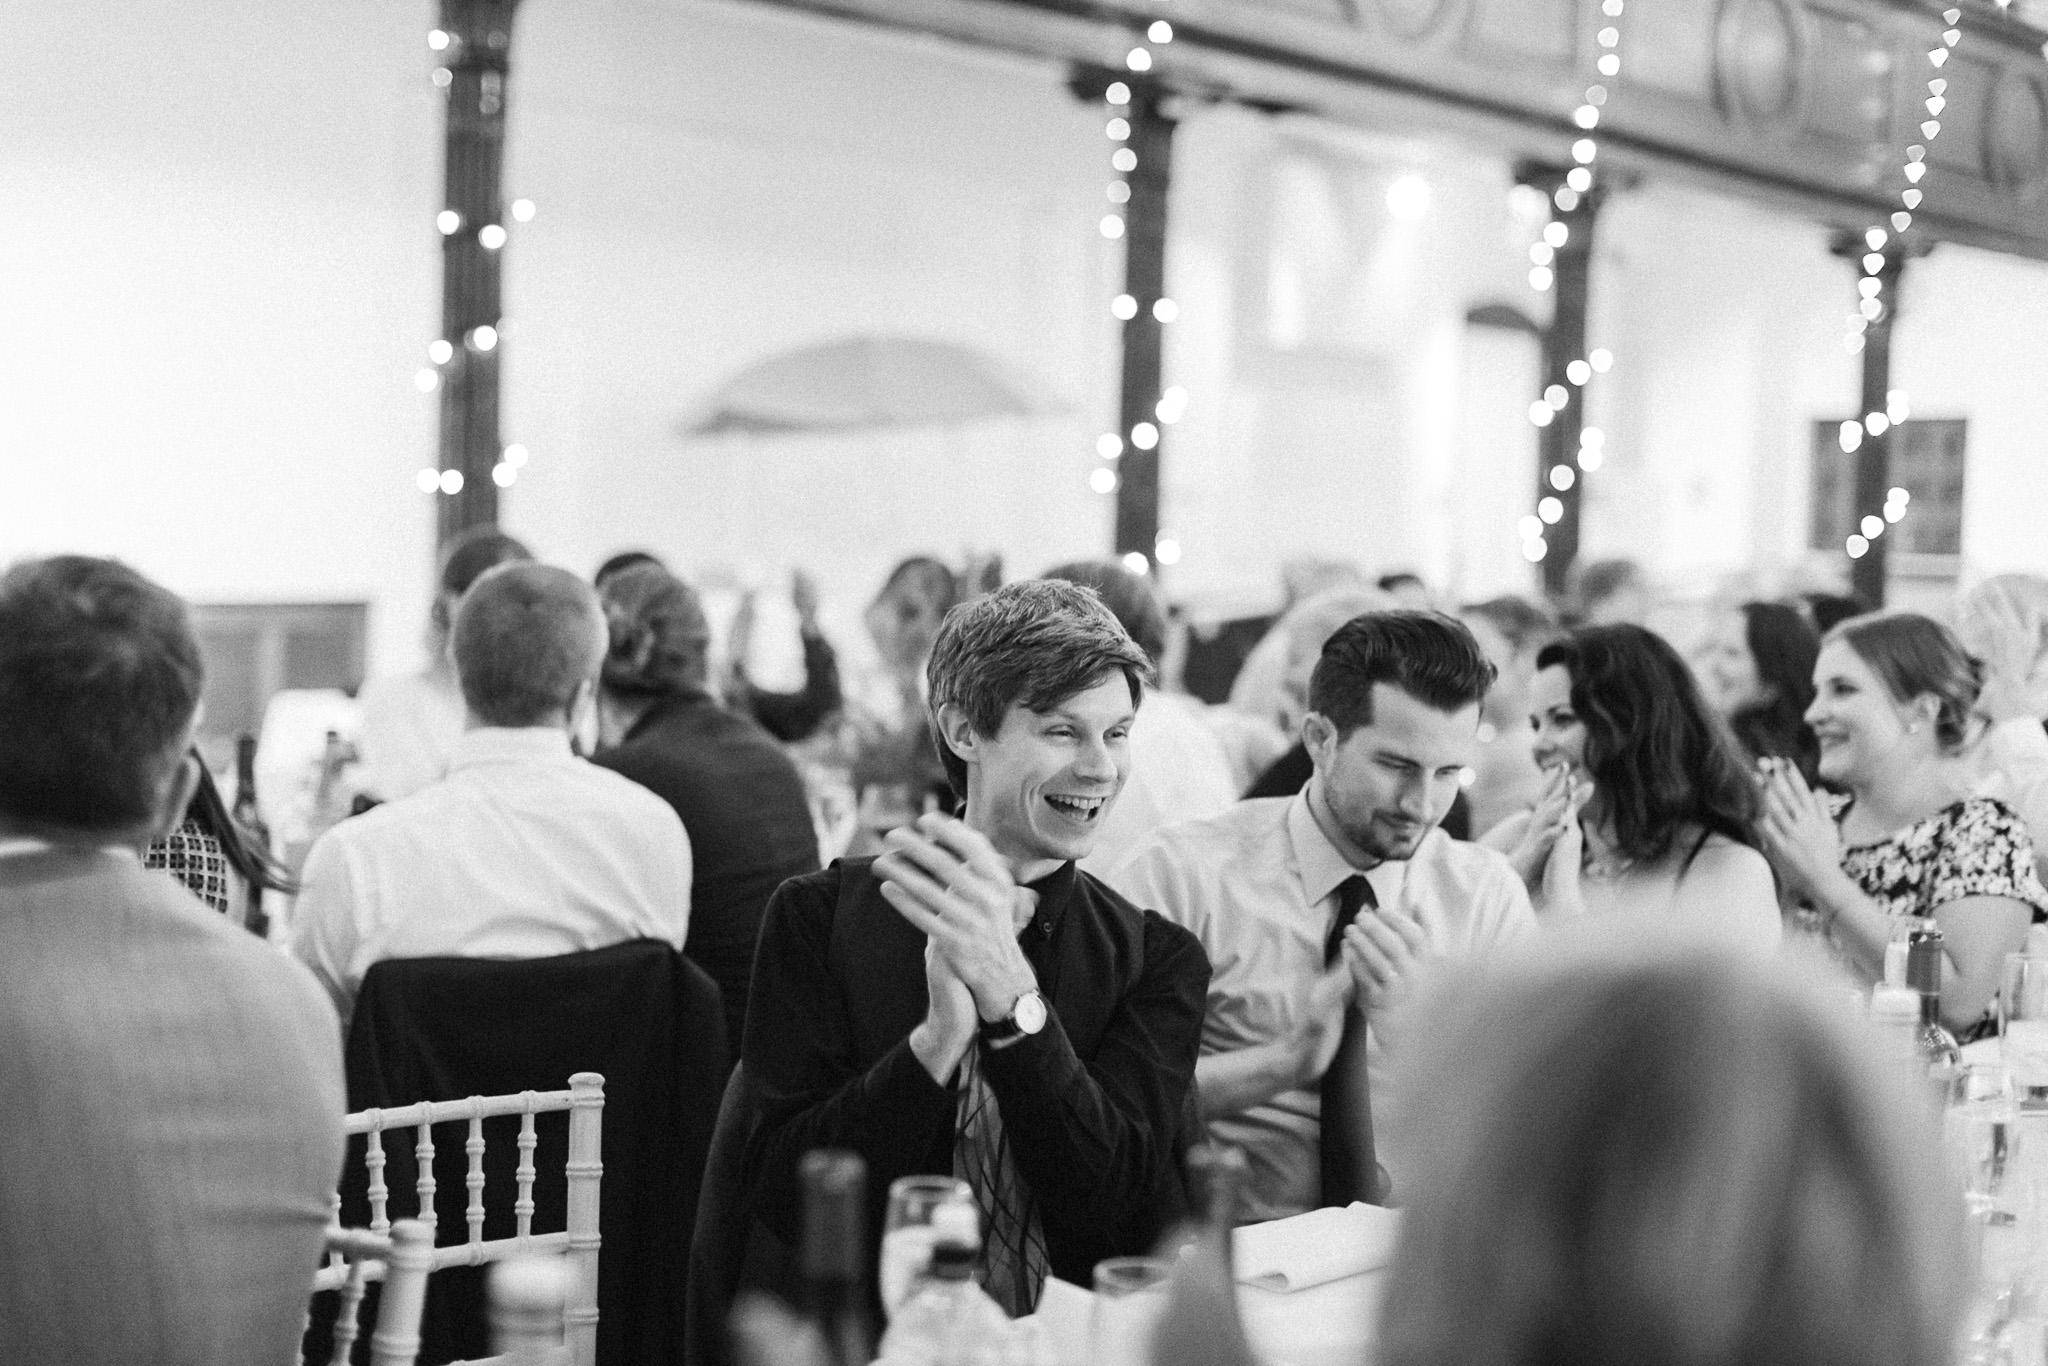 st_andrews_fabrica_brighton_wedding_616.jpg